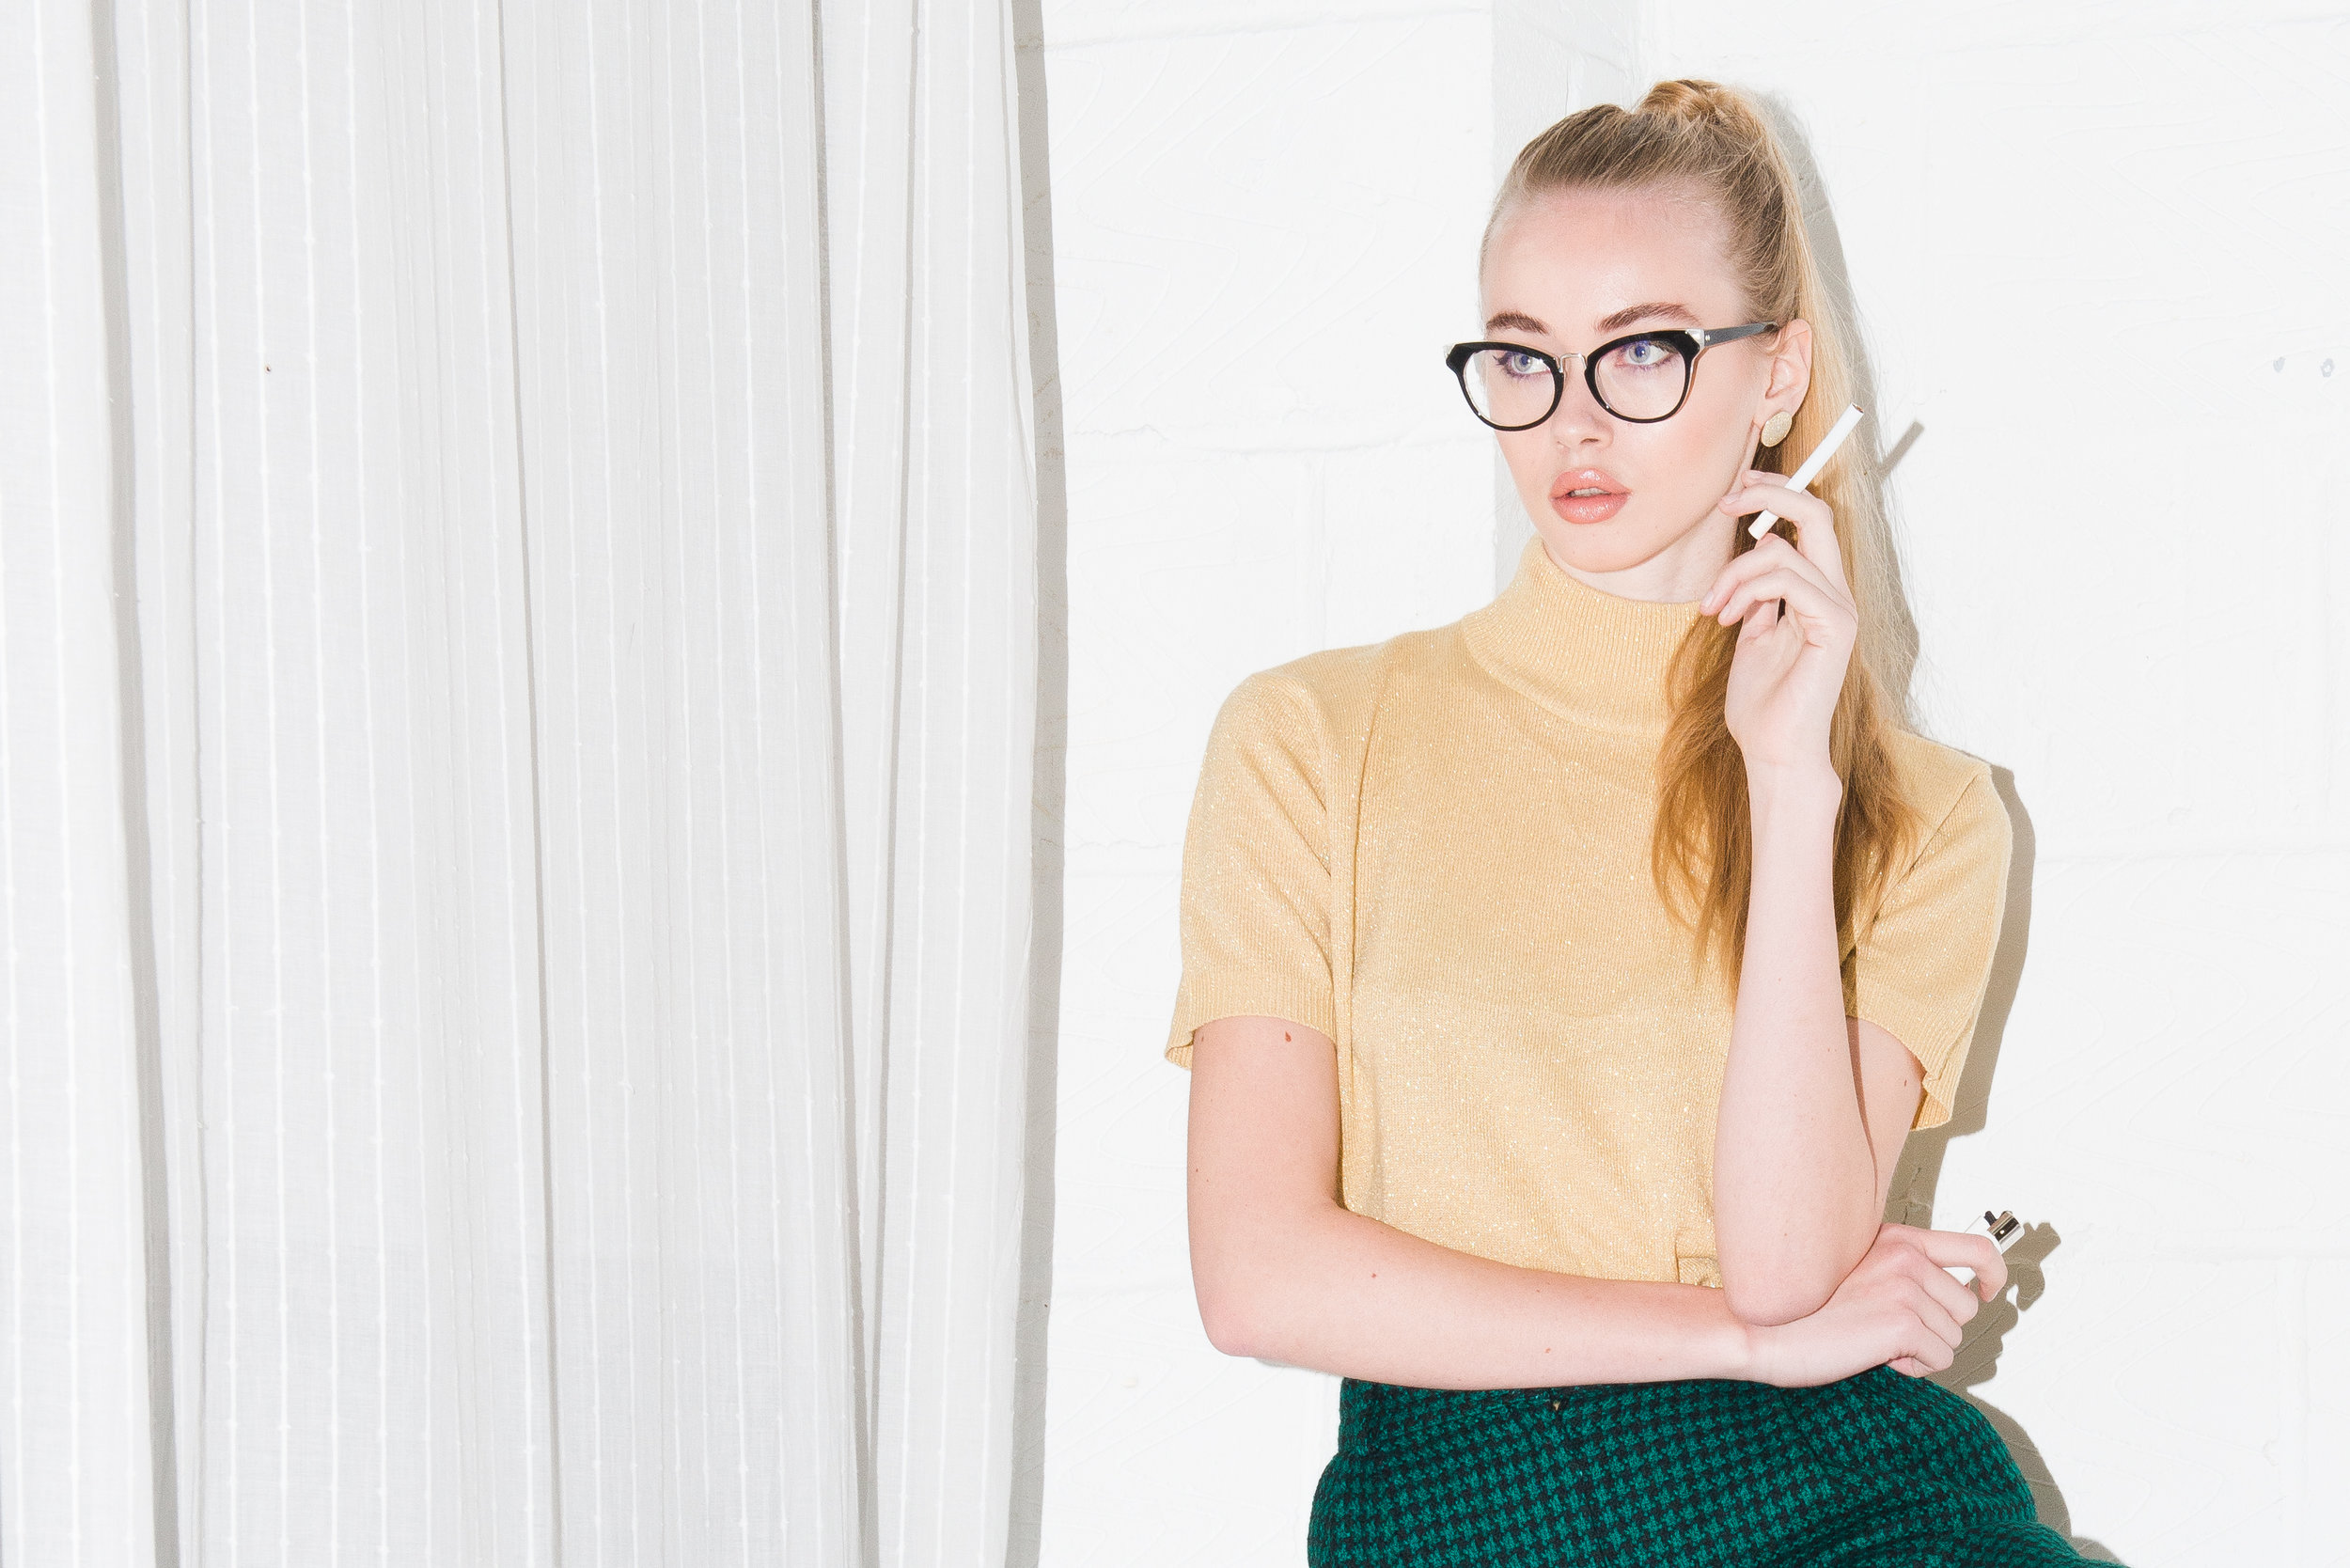 Fashion shoot_SA_HiRes_001.jpg